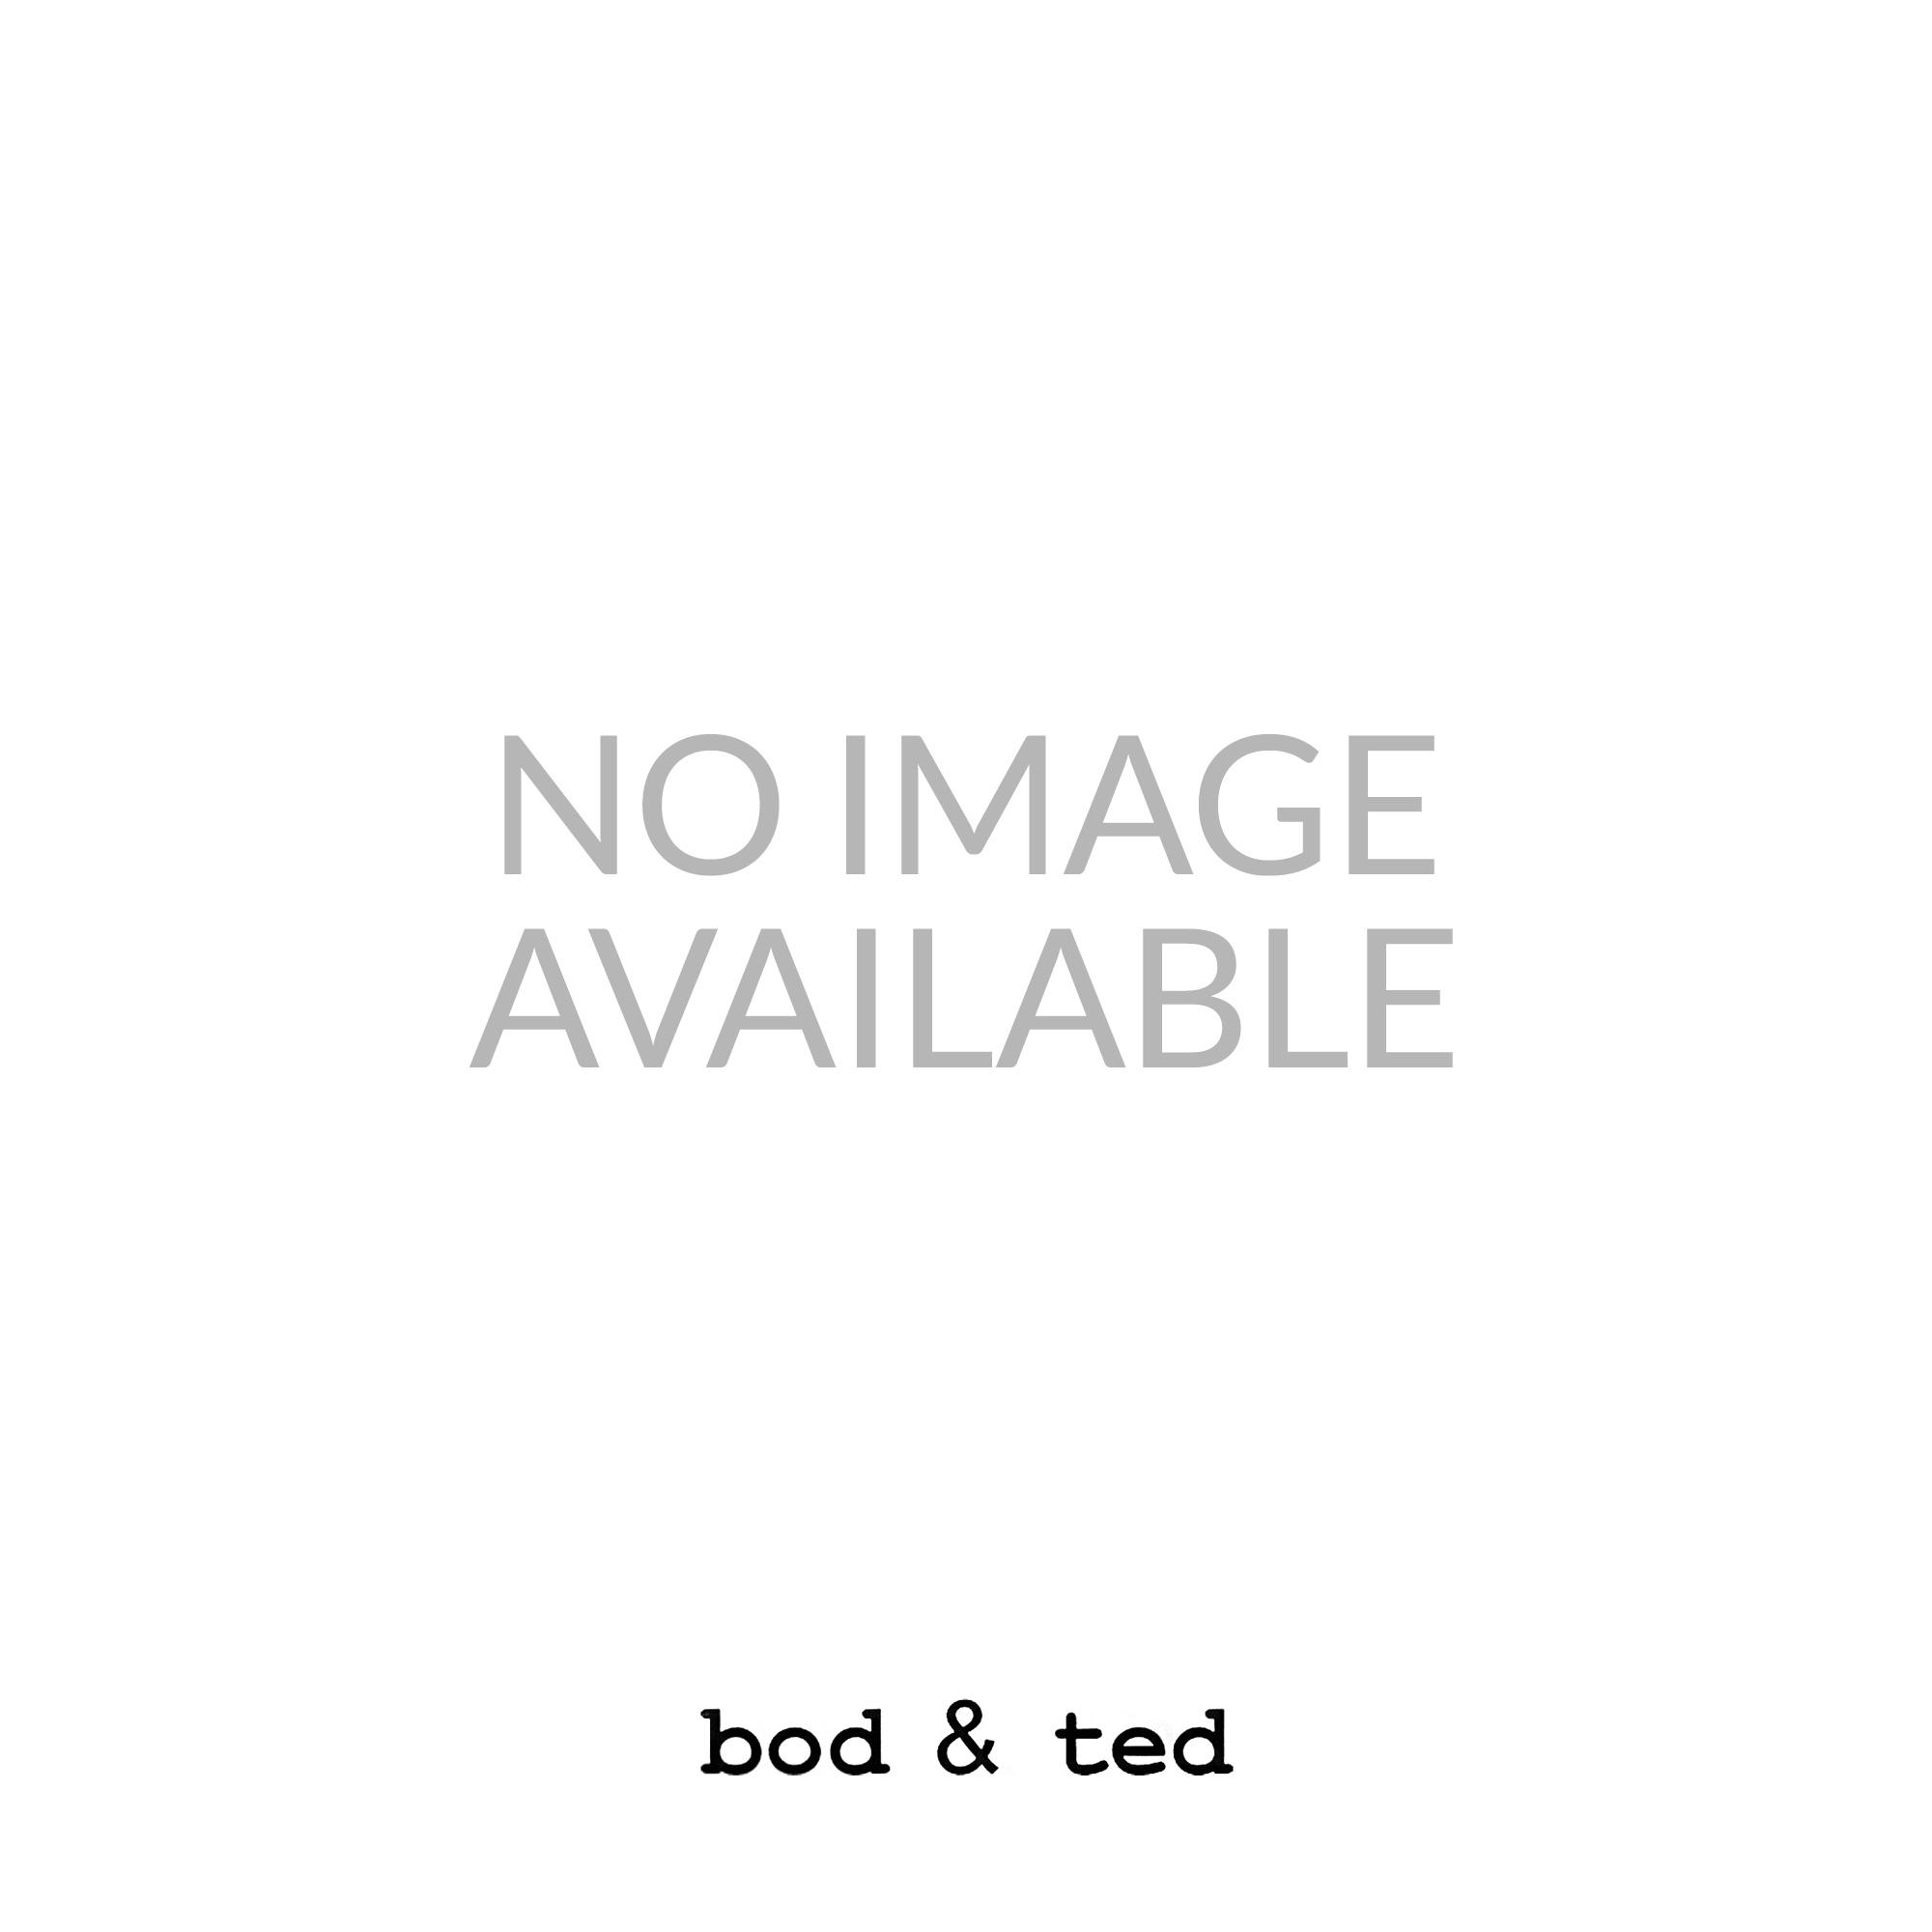 Skandinavisk LEMPI (LEM-PE) Candle